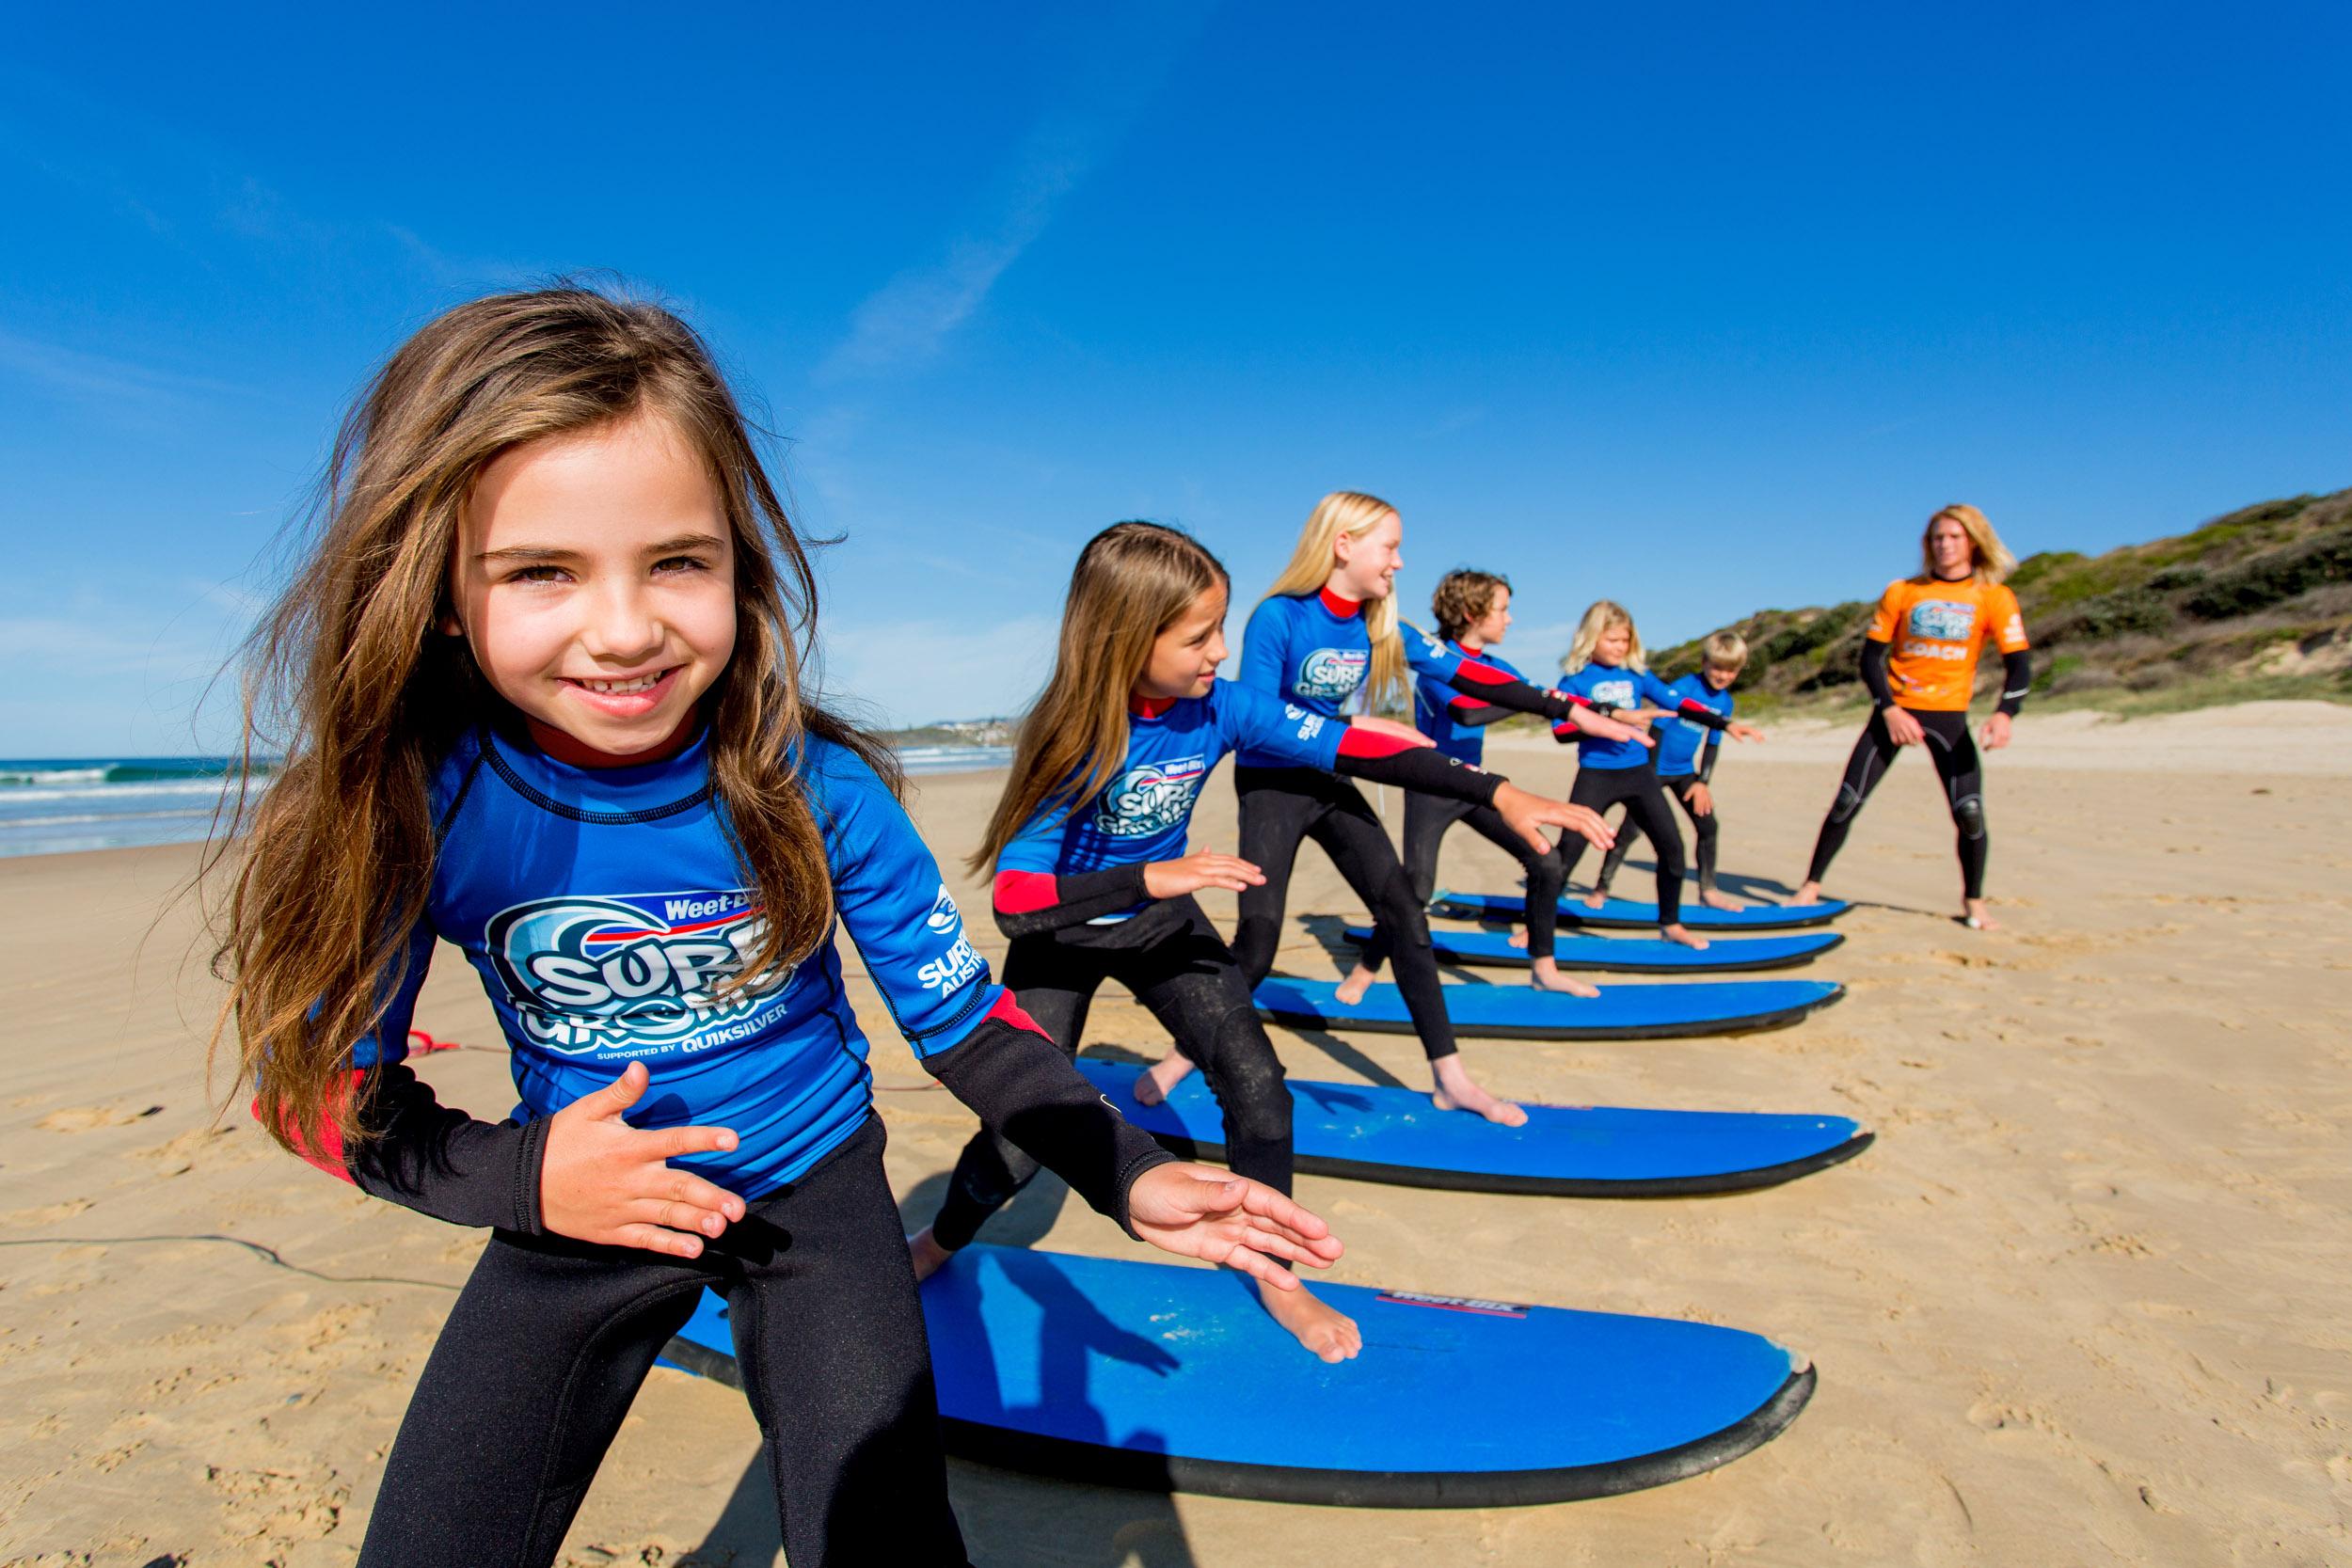 surfing-australia-surf-groms-photography-SGWB-135.jpg